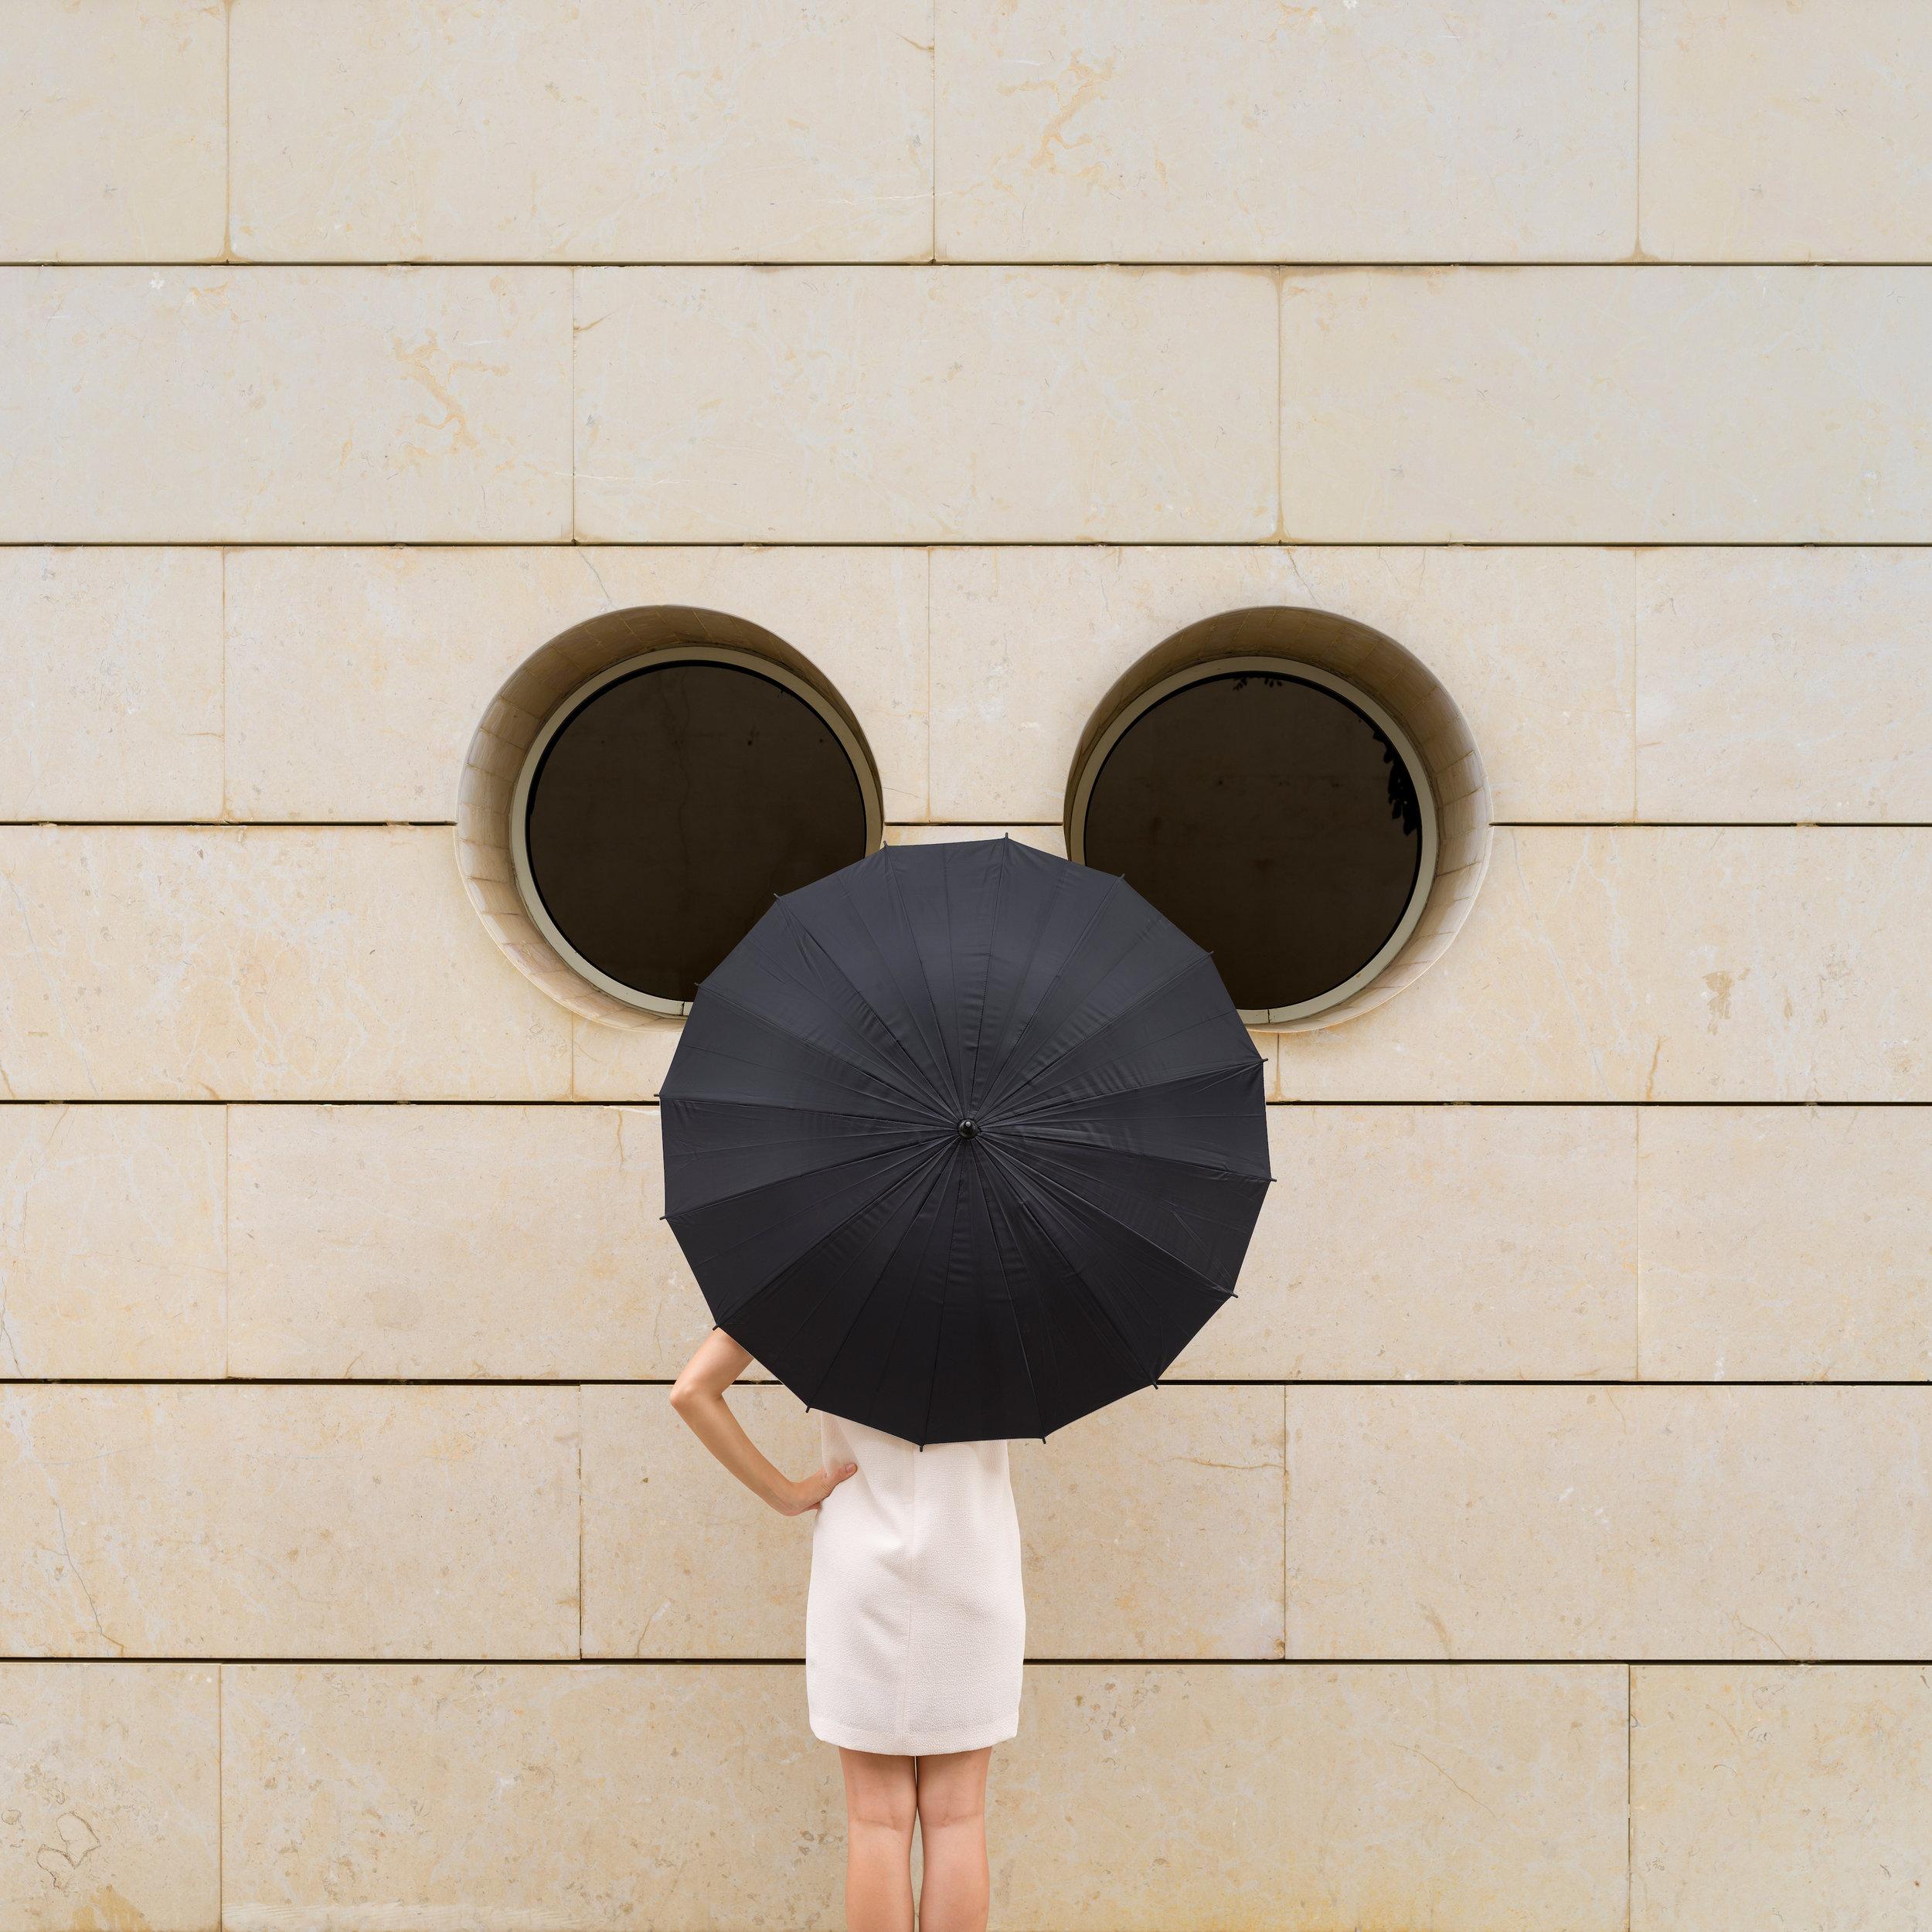 Wall Disney, 2018, Archival Pigment Print, 110 × 110 cm (43 3/10 × 43 3/10 in)